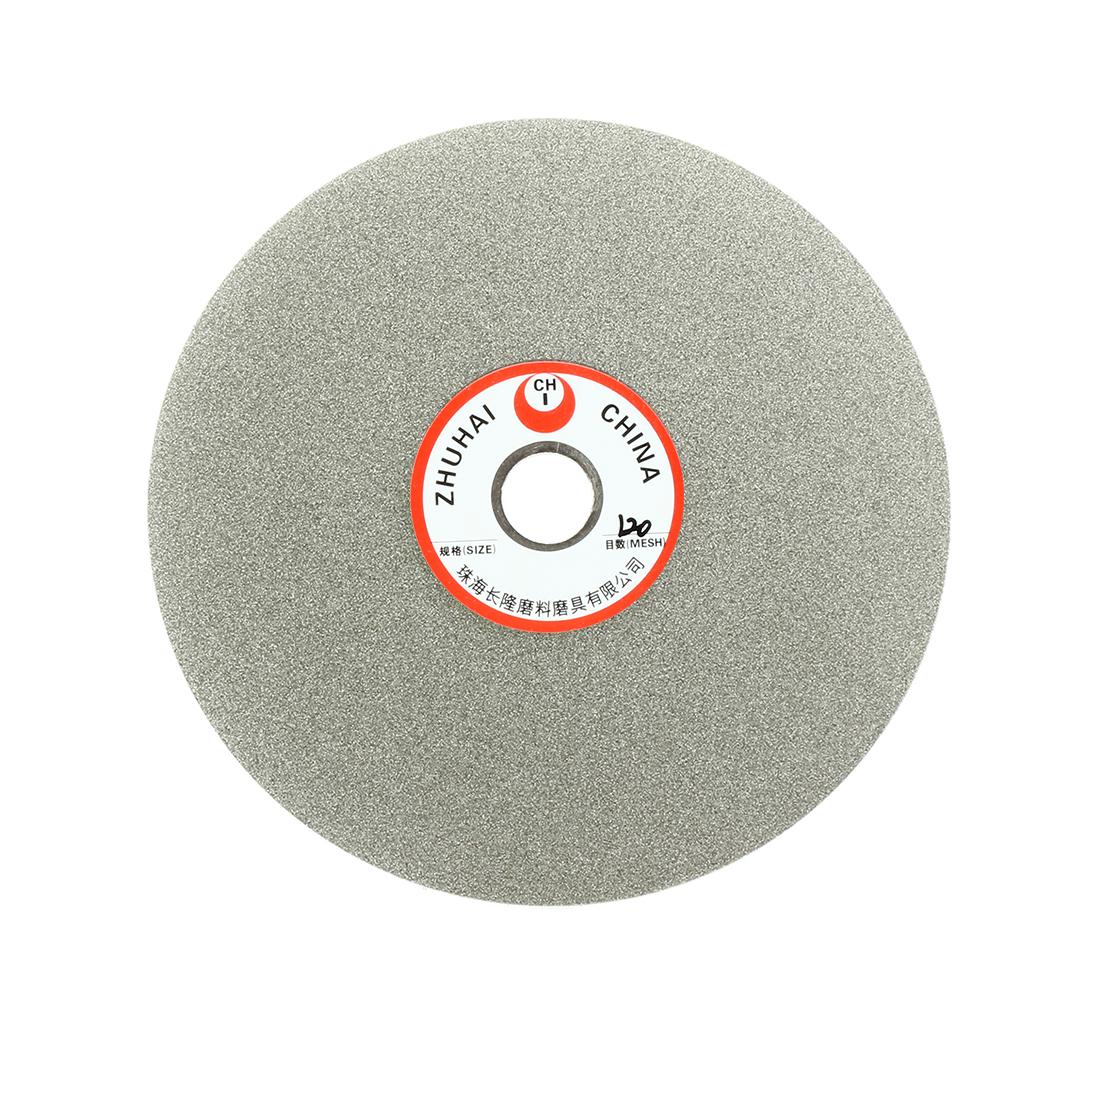 6-inch Grit 120 Diamond Coated Flat Lap Wheel Grinding Disc Polishing Tool